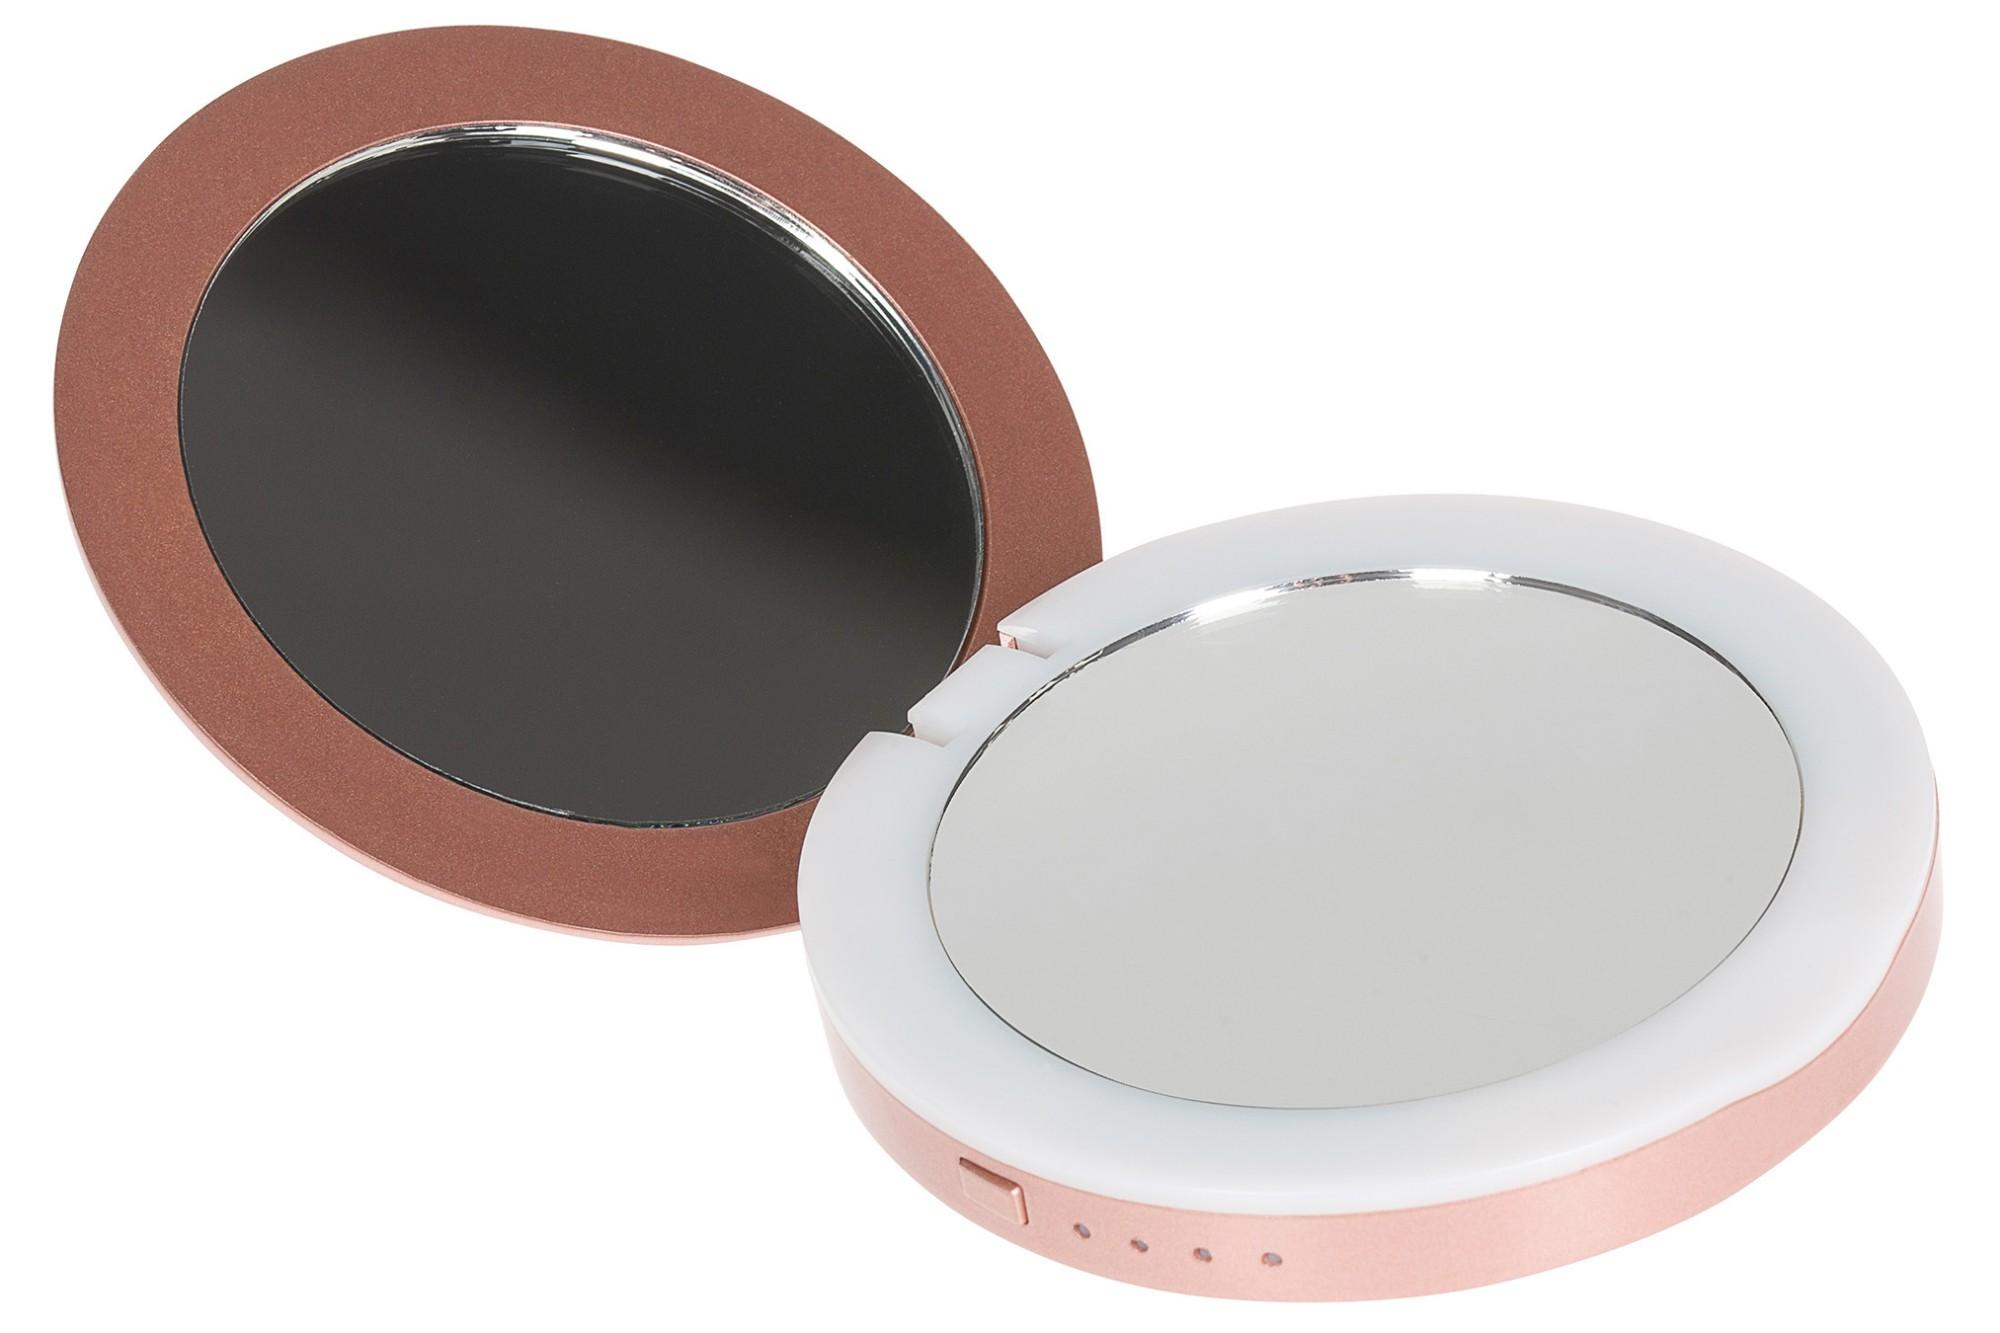 STATUS Compact Mirror 3000mAh Portable Power Bank with LED Illumination - Rose Gold